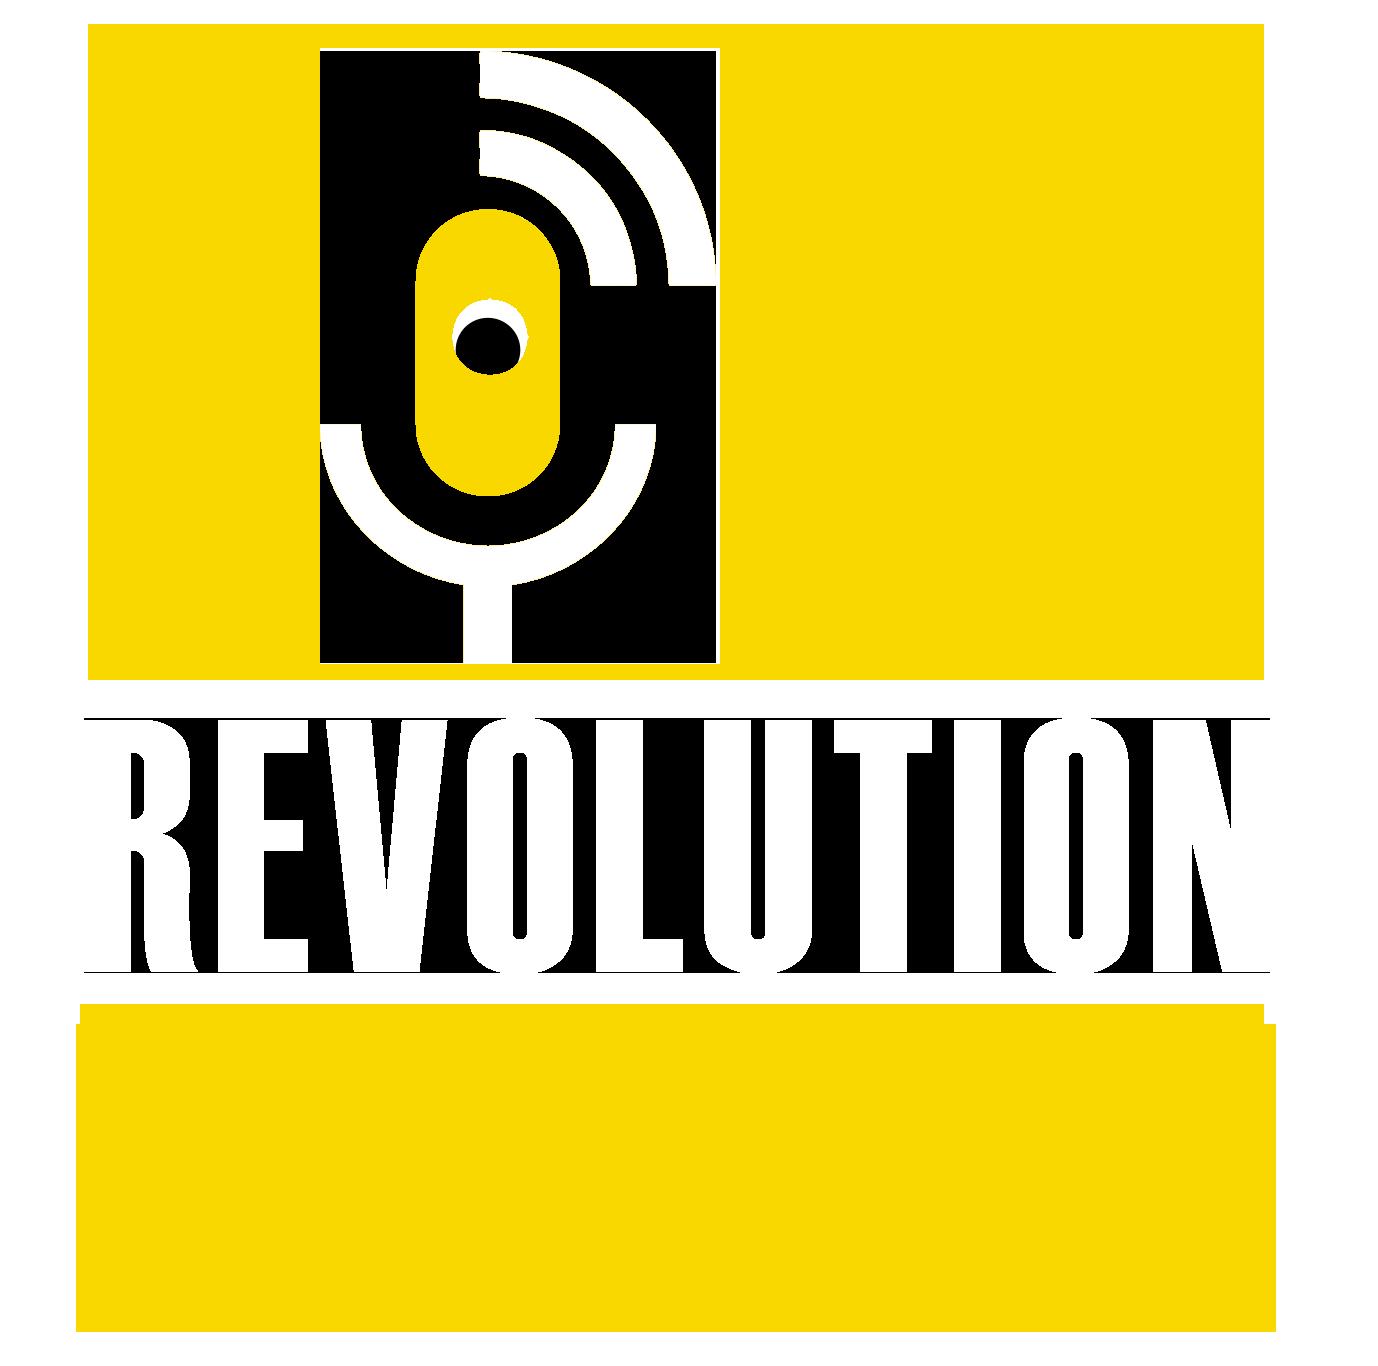 songrevolution-workshop-logo-yellow-white